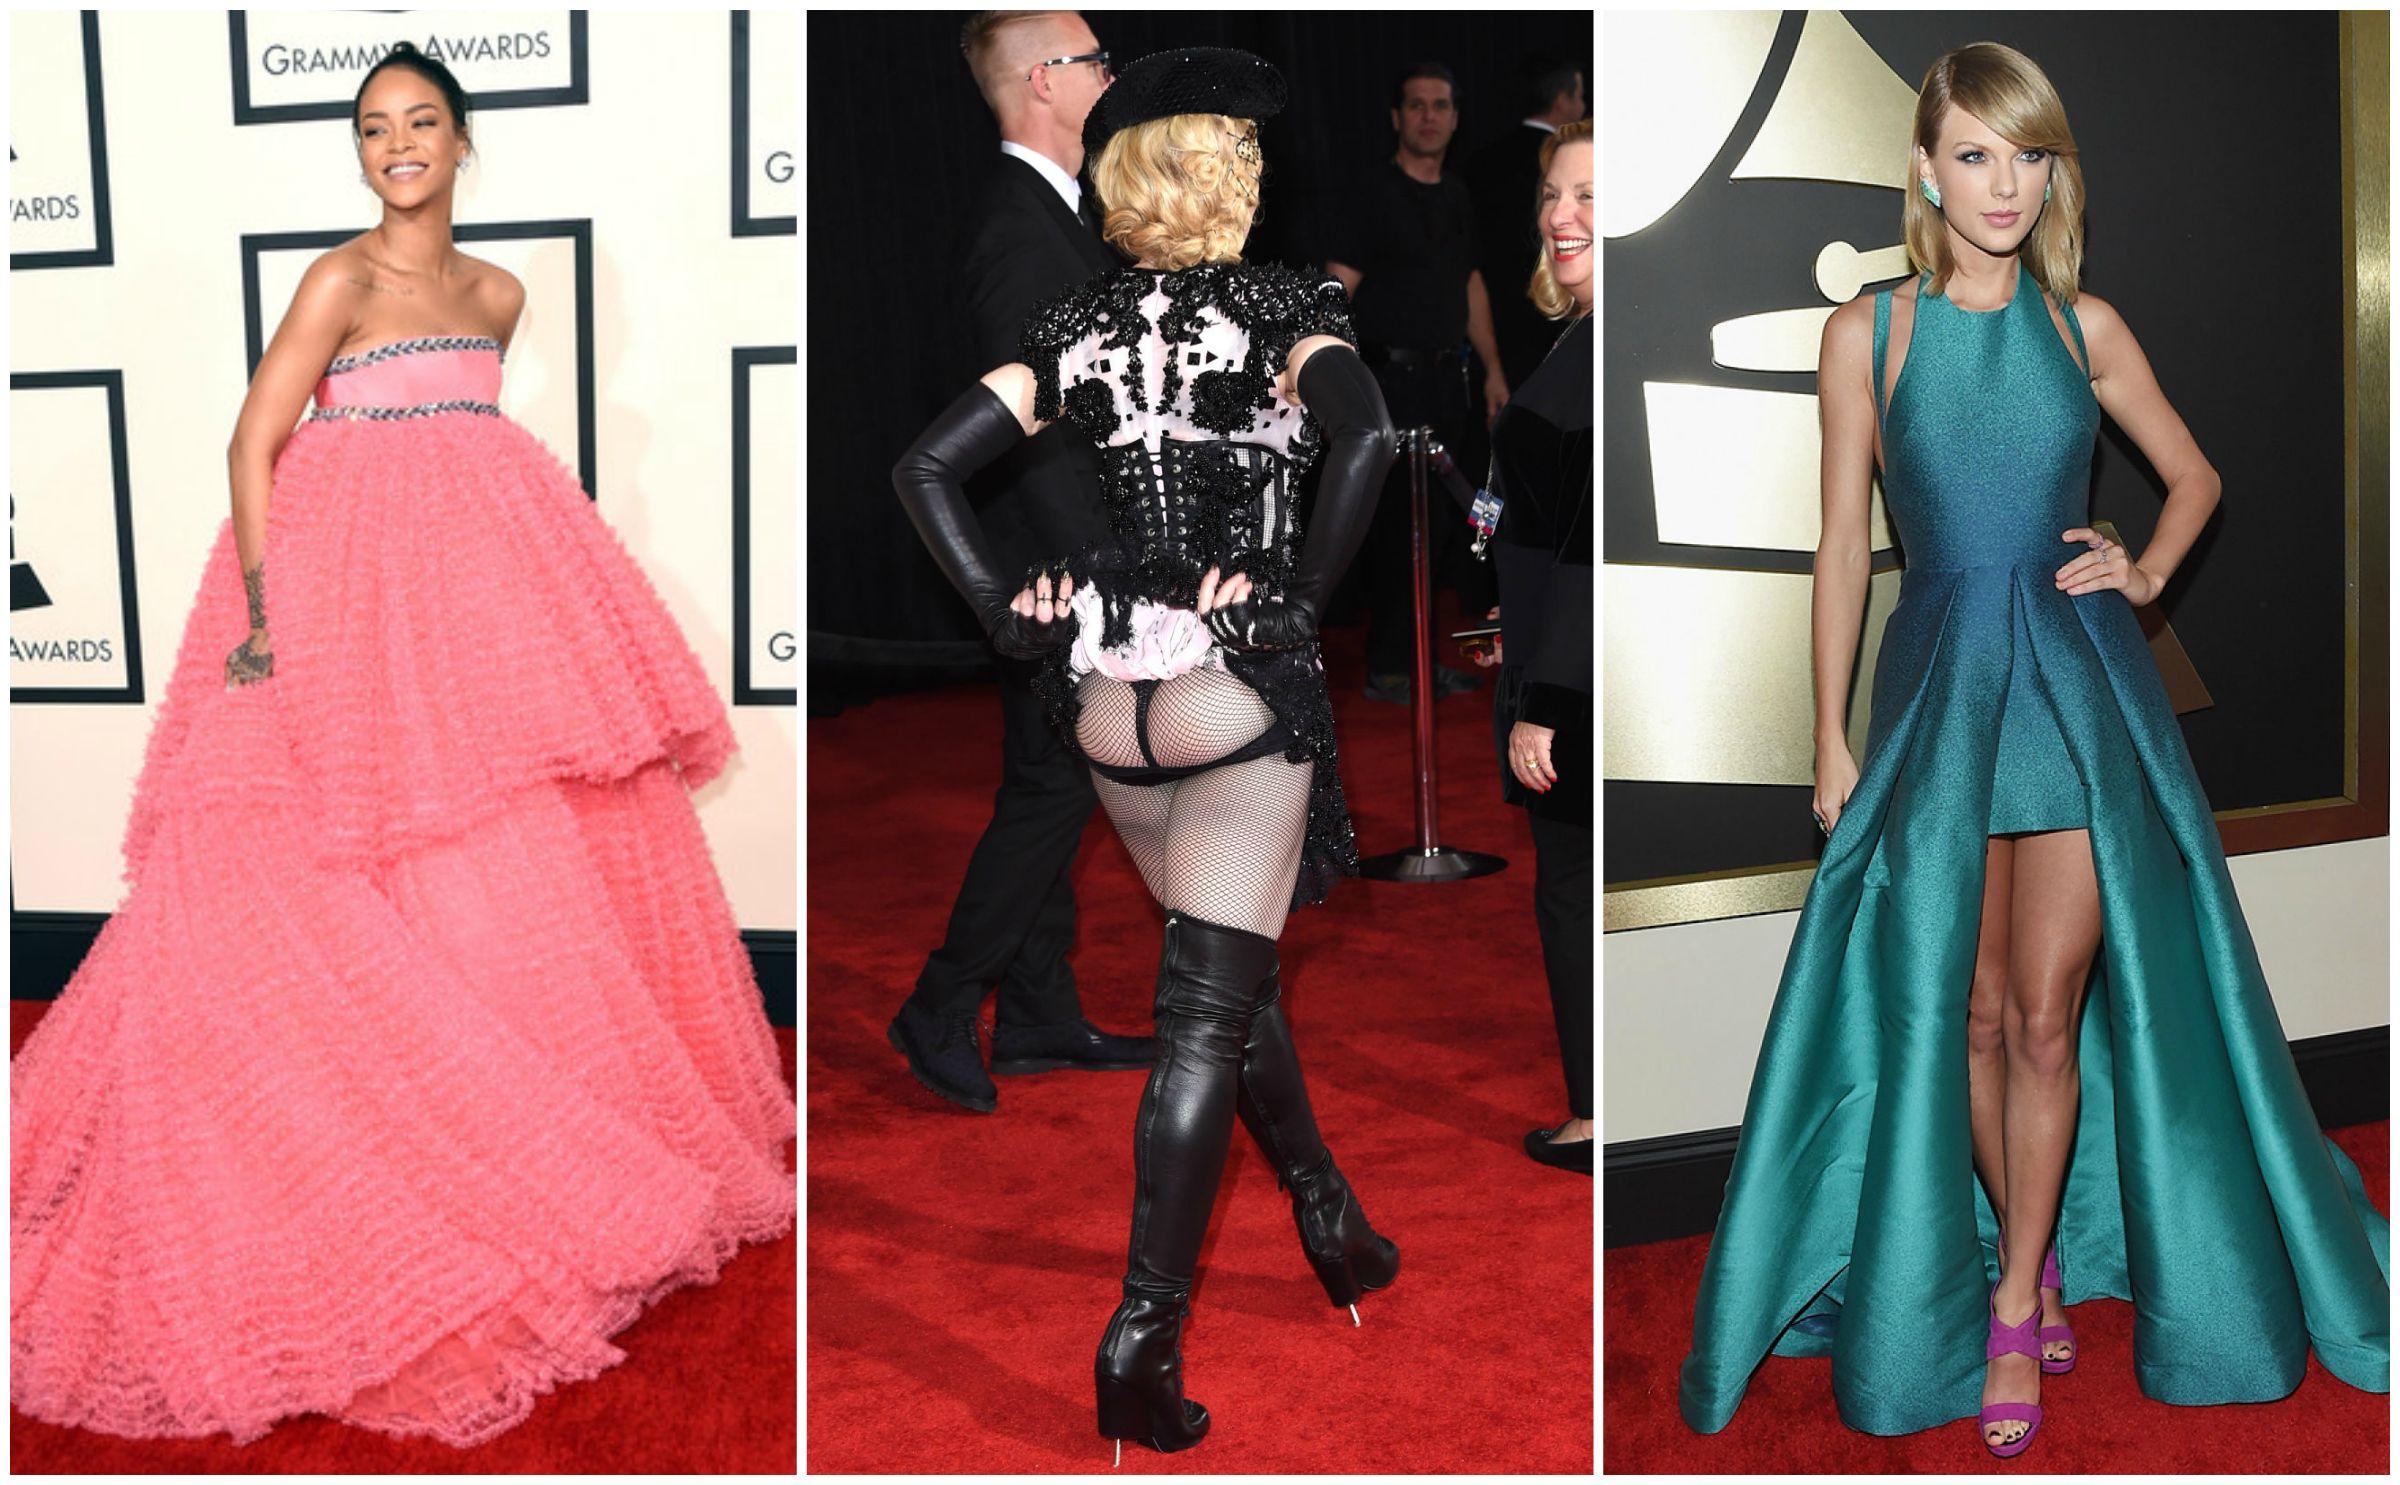 The 2015 Grammy Red Carpet Best & Worst Dressed!